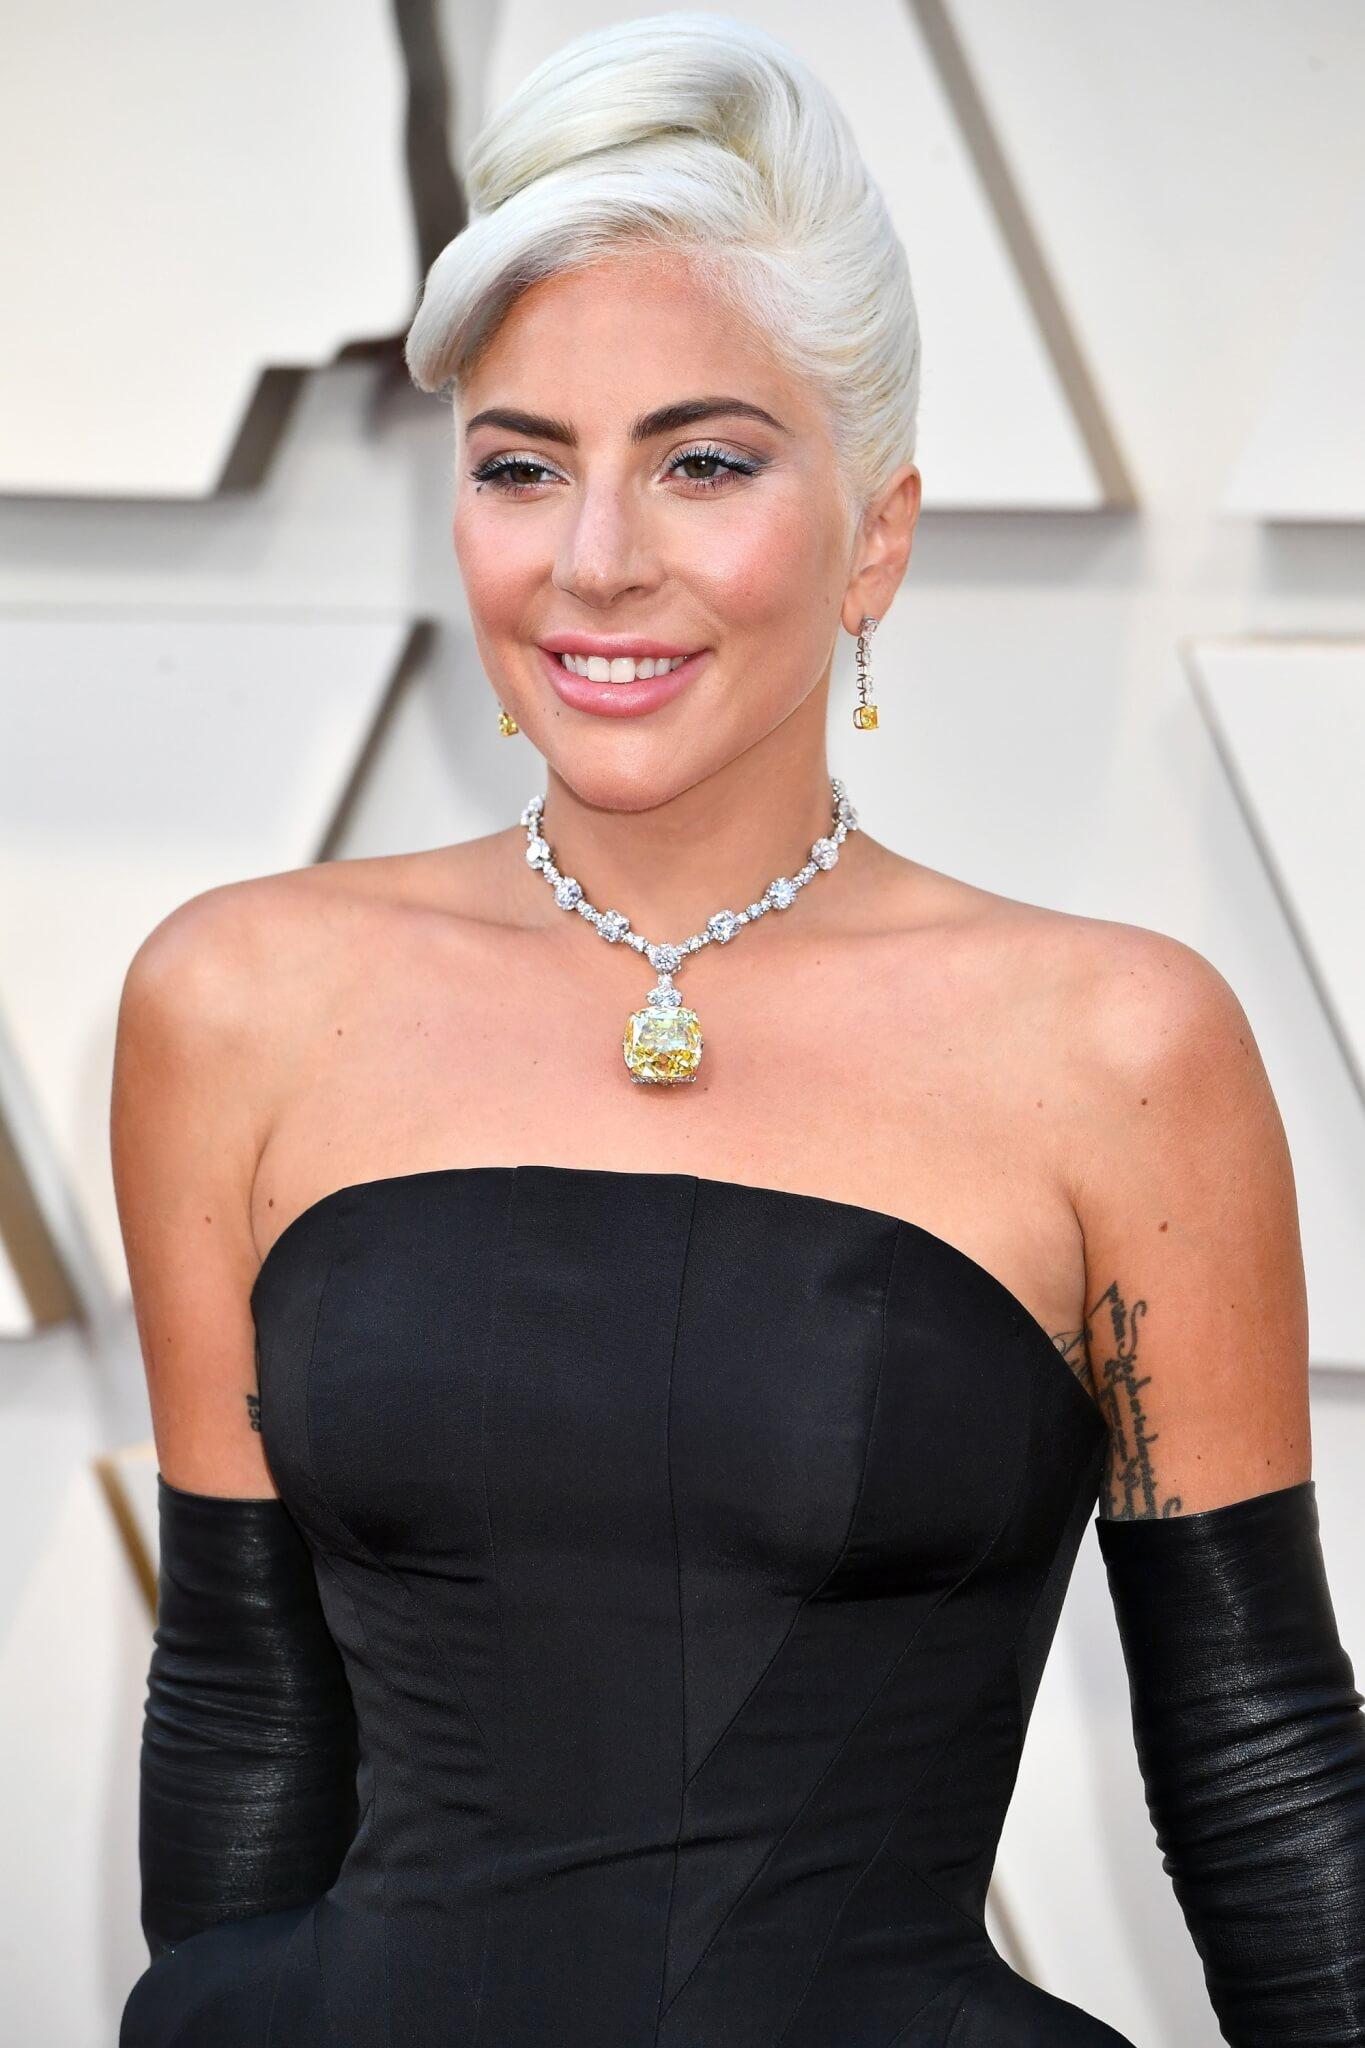 Lady Gaga在奧斯卡紅地氈上亦配戴過The Tiffany Diamond的項鏈。